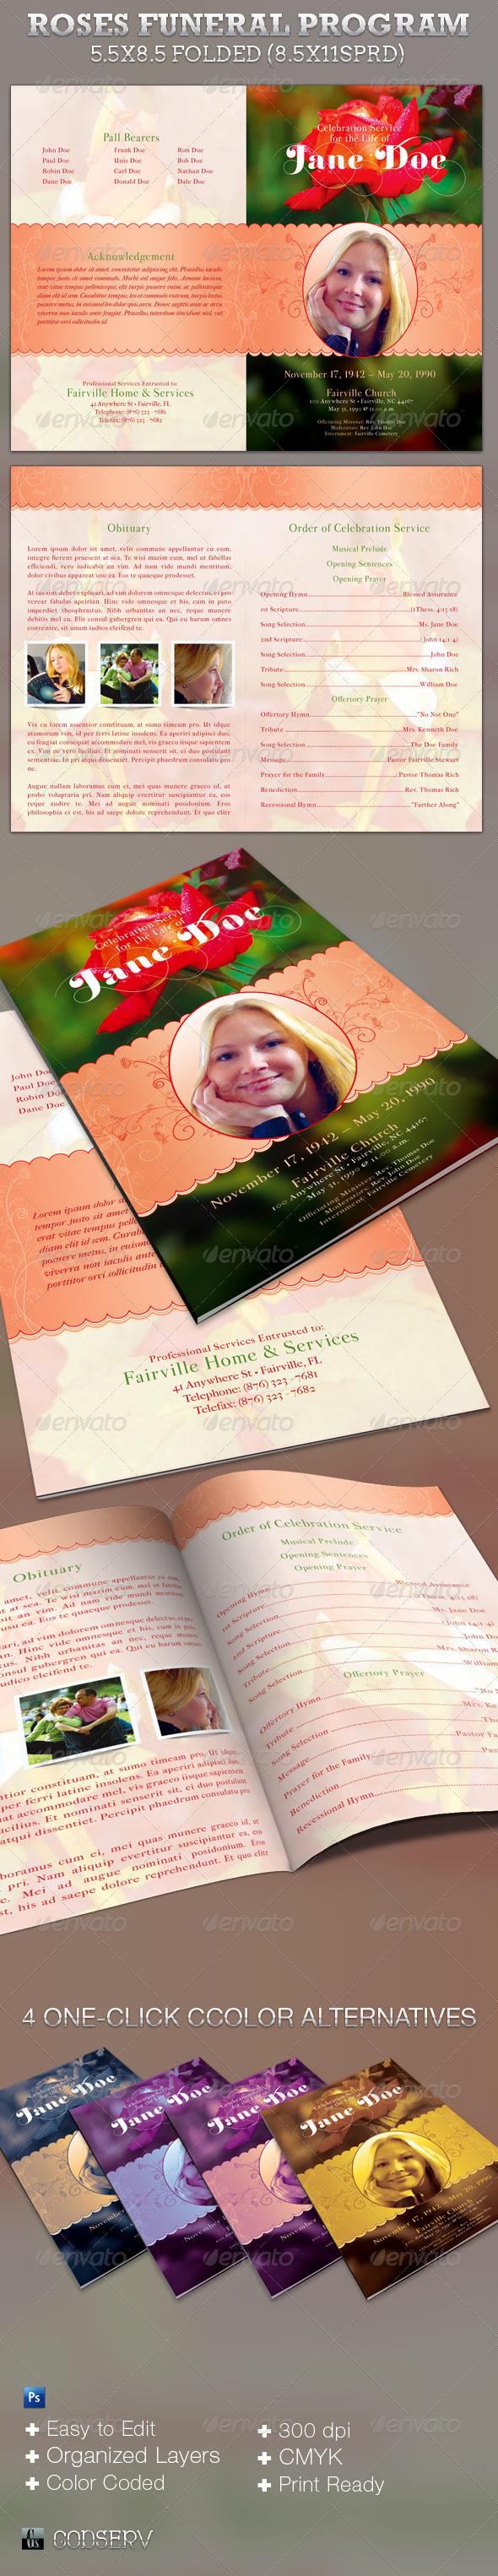 Roses Funeral Program Template - Informational Brochures